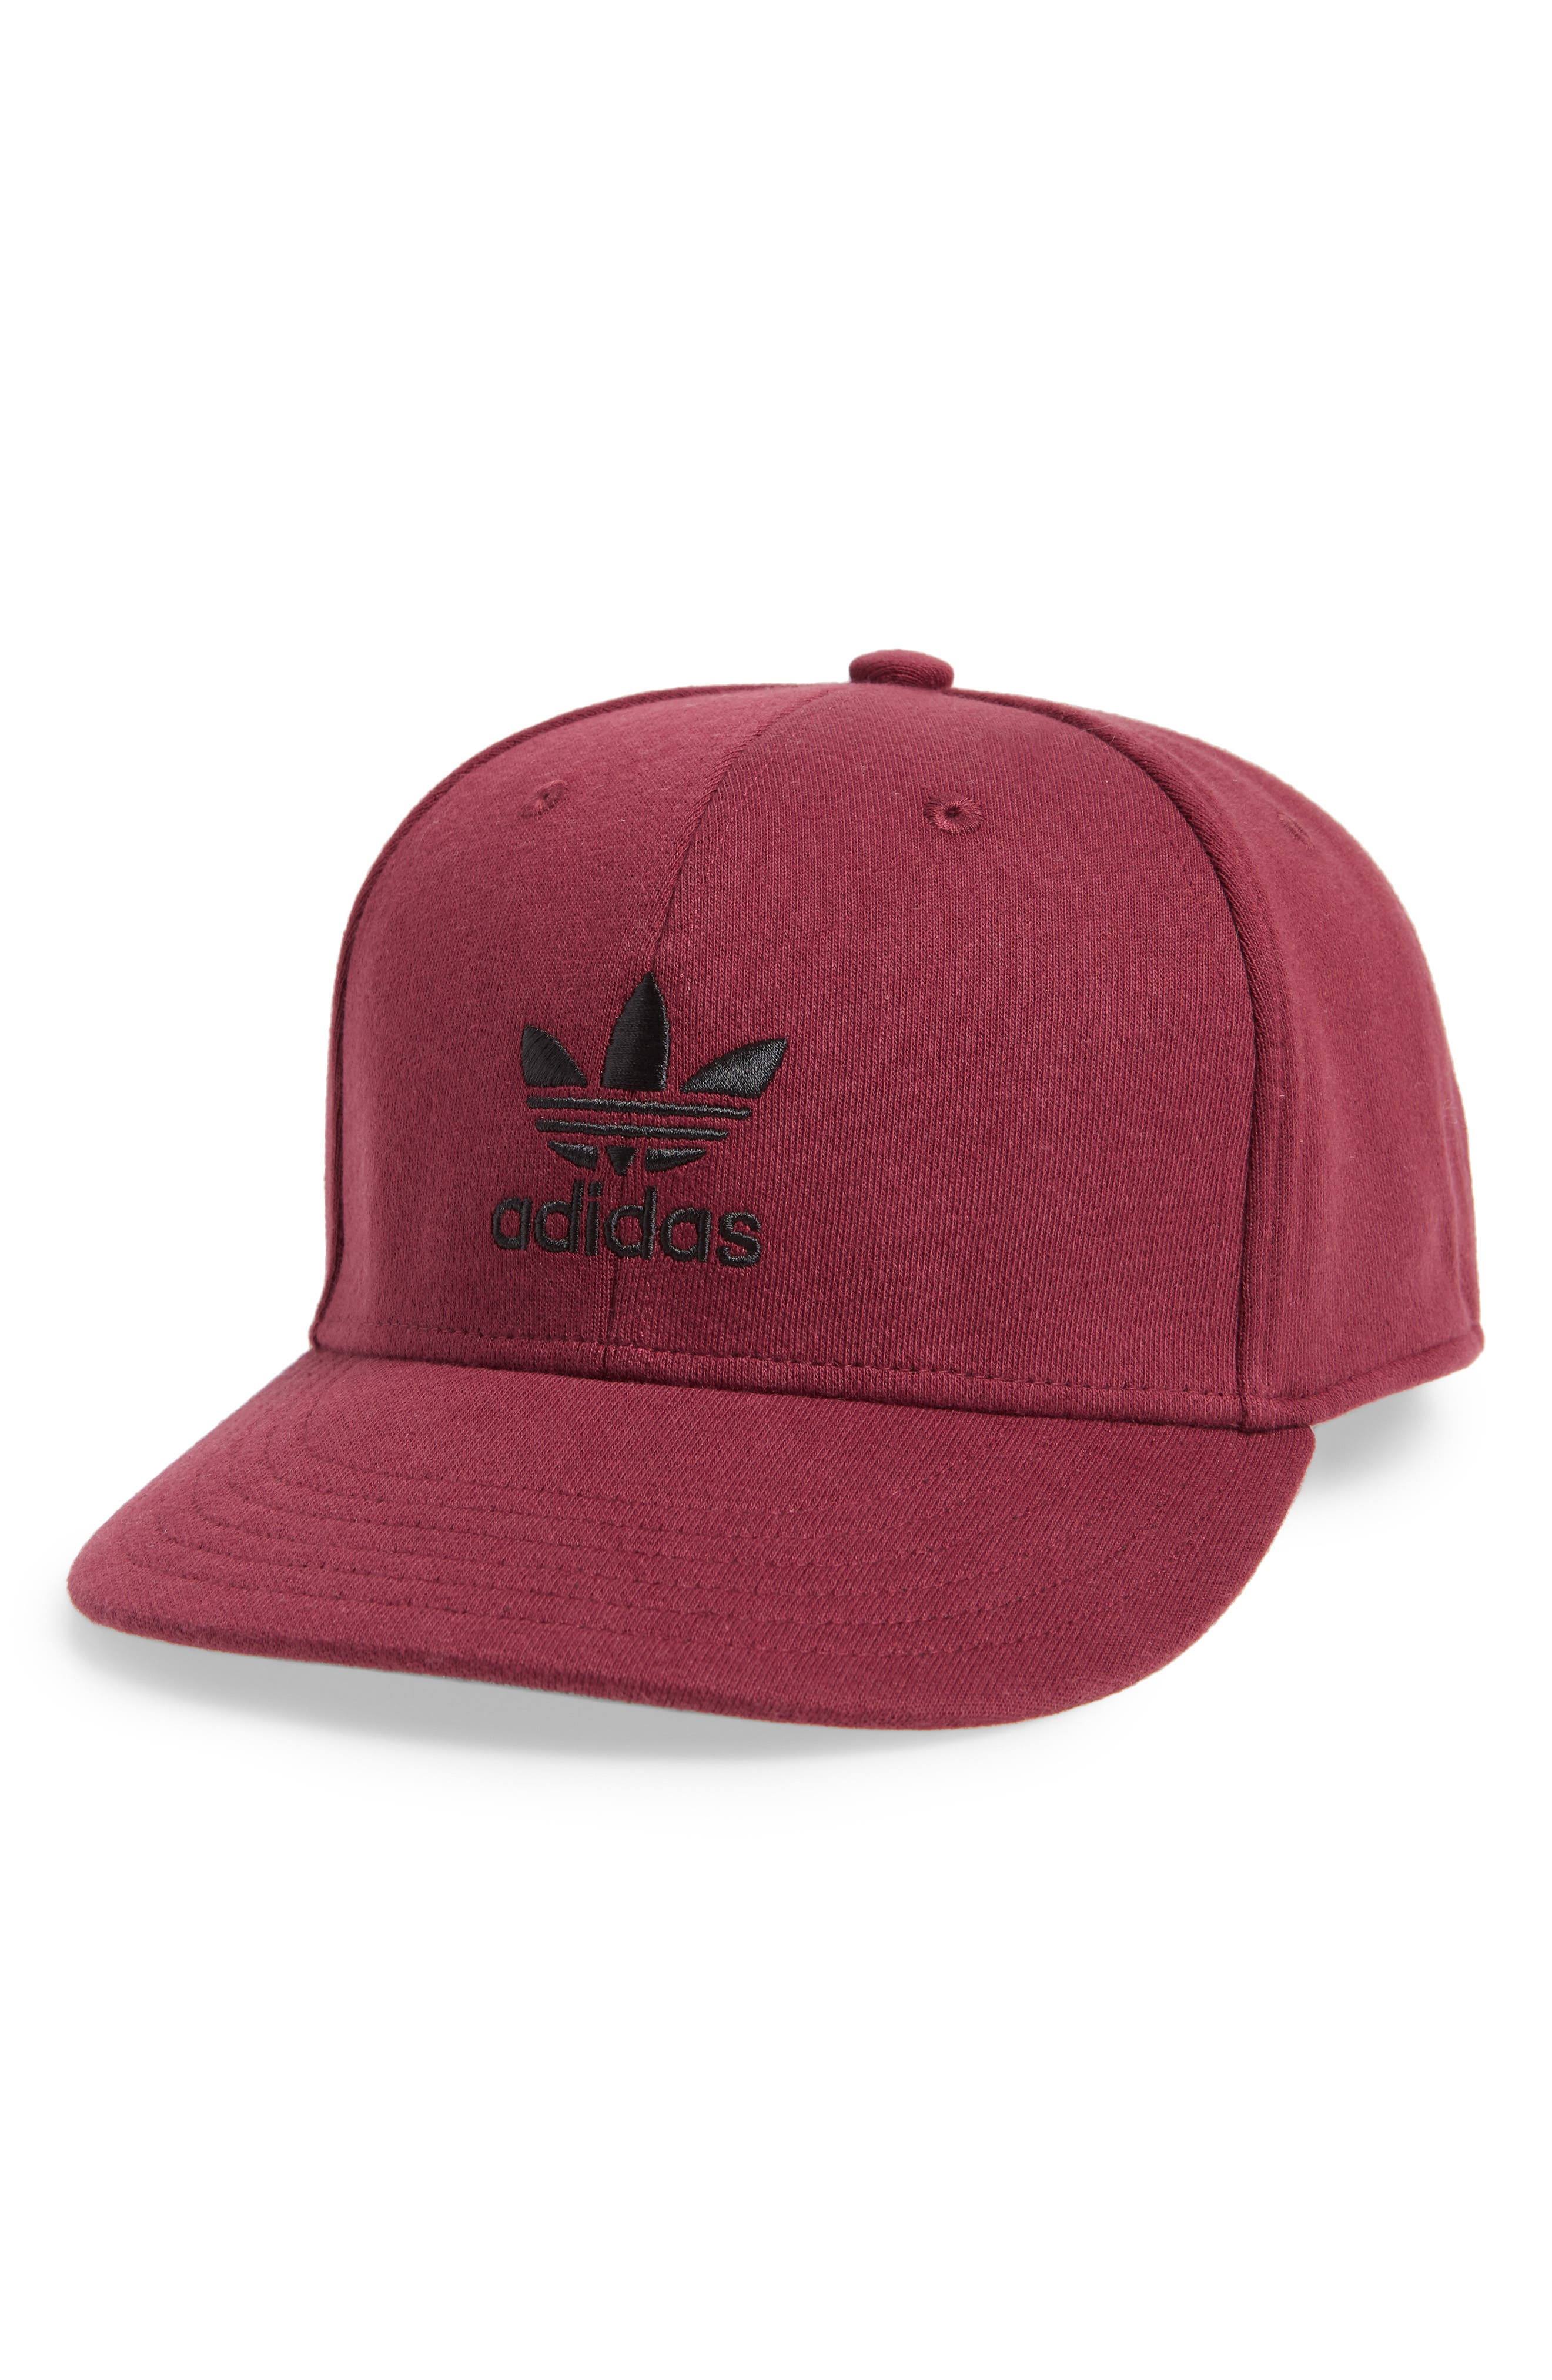 58d6c3fd99f ADIDAS ORIGINALS. Trefoil Snapback Baseball Cap - Red in Collegiate Burgundy   Black